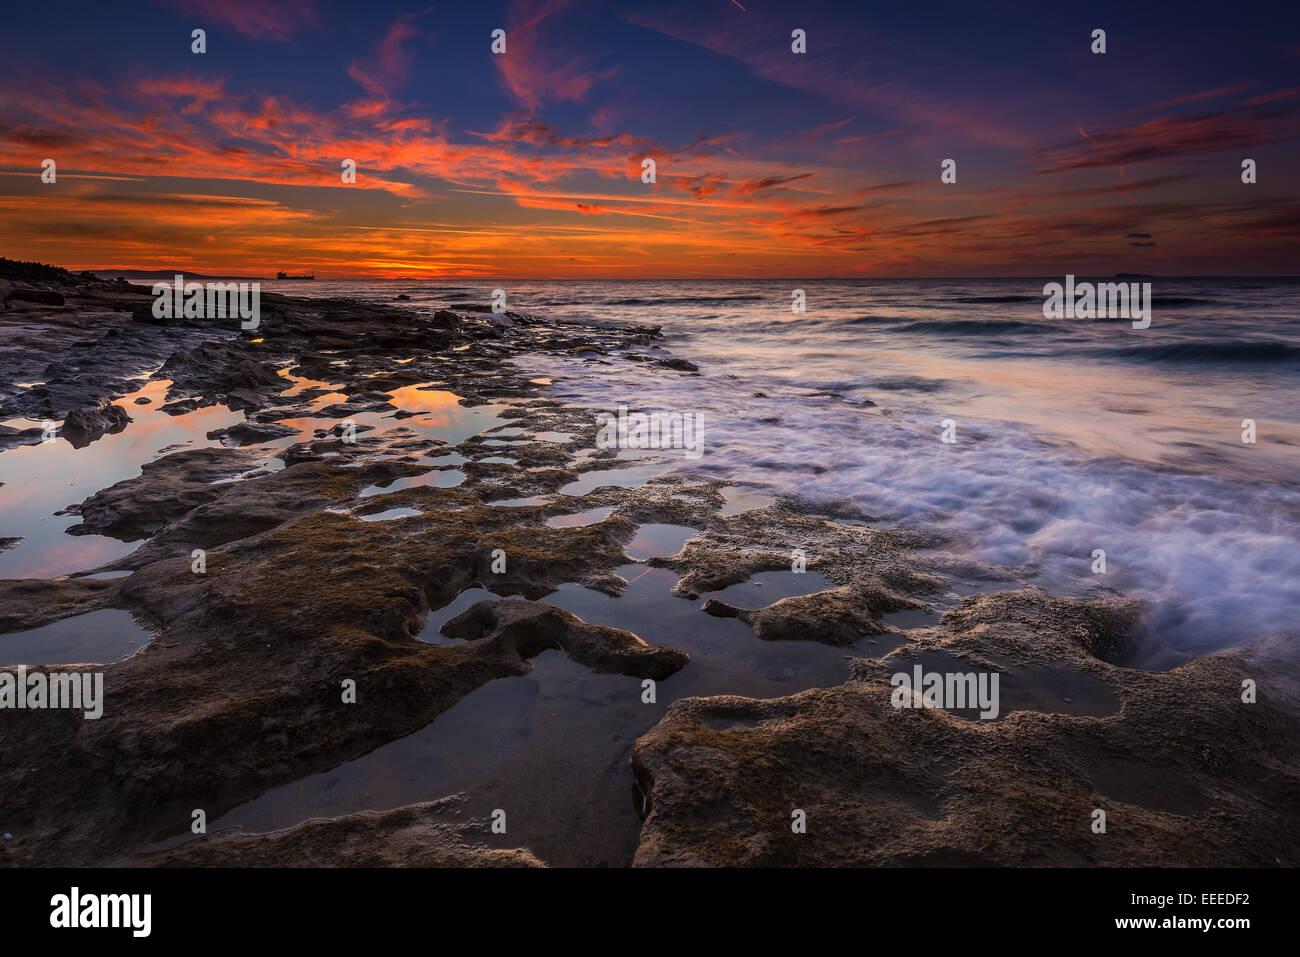 winter sunset in Kos island Greece - Stock Image